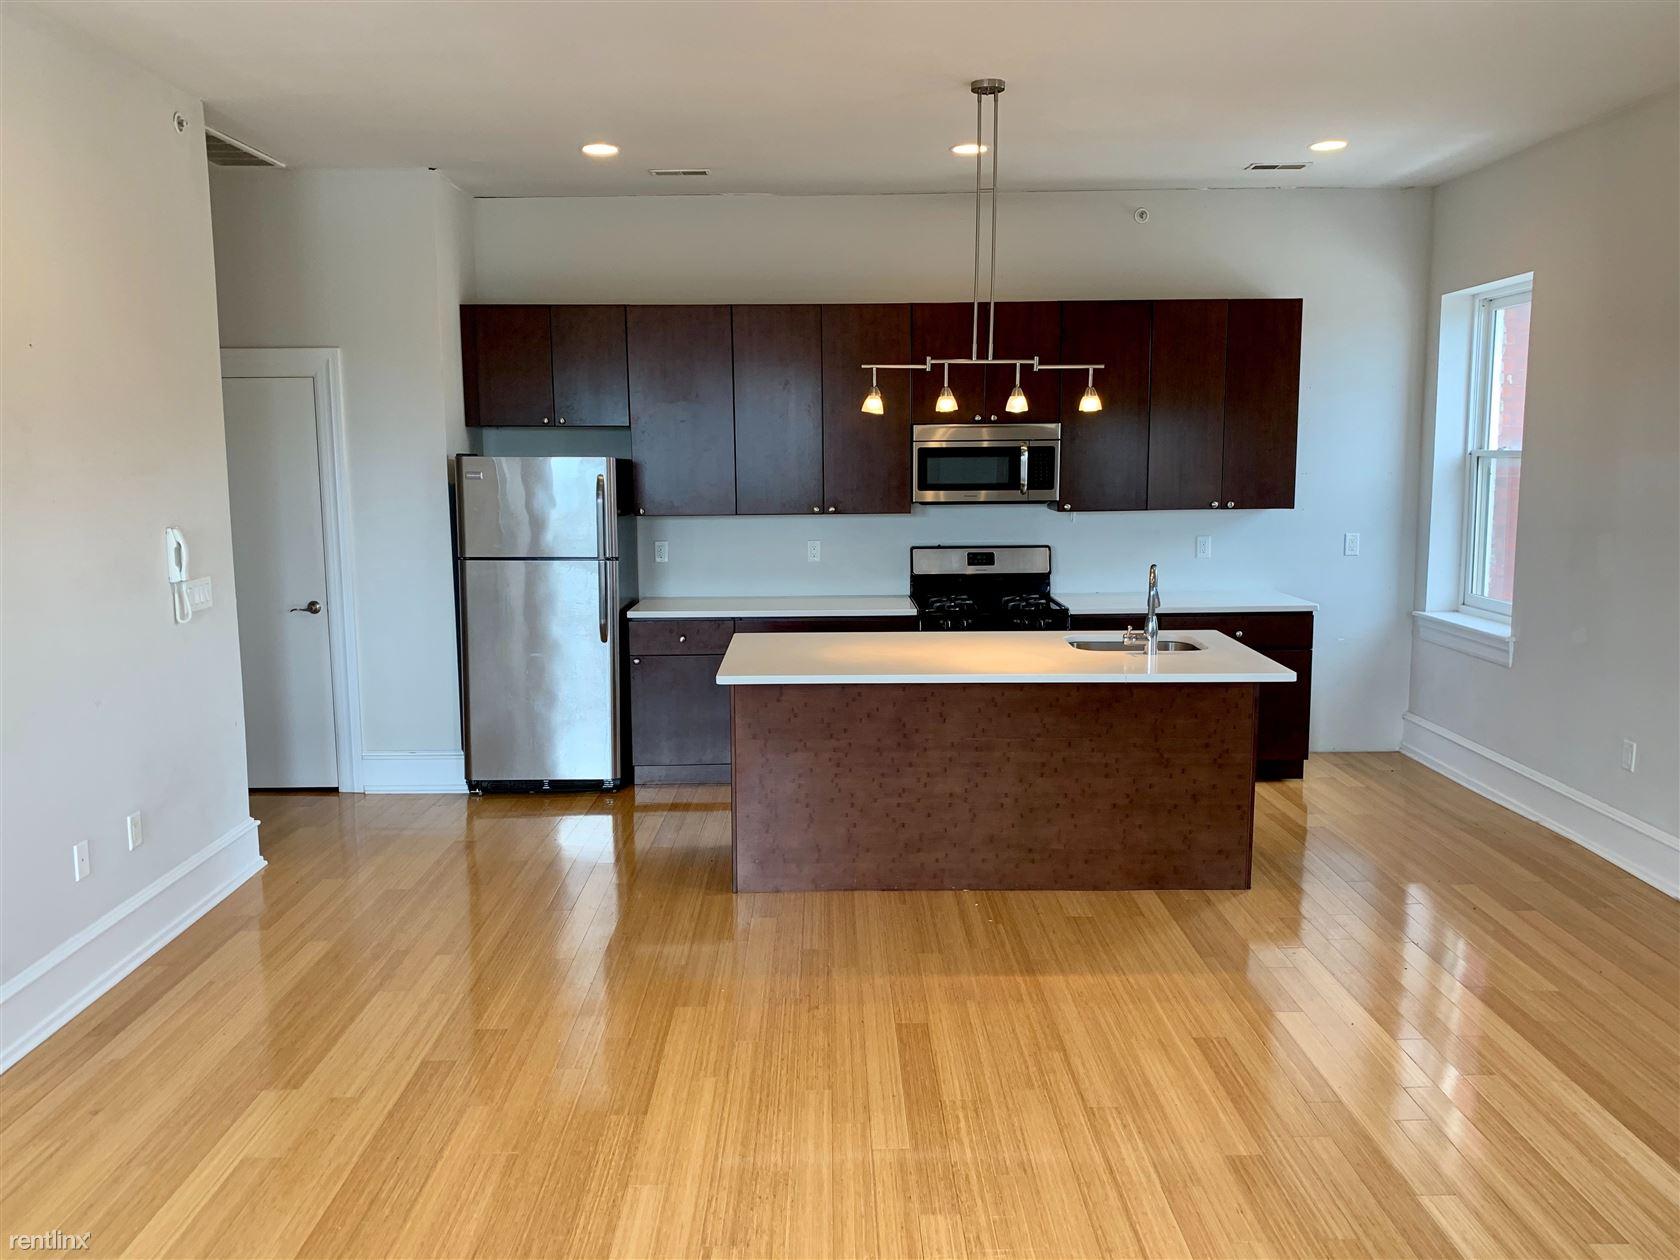 2136 E Dauphin St Apt 203, Philadelphia, PA - $1,600 USD/ month